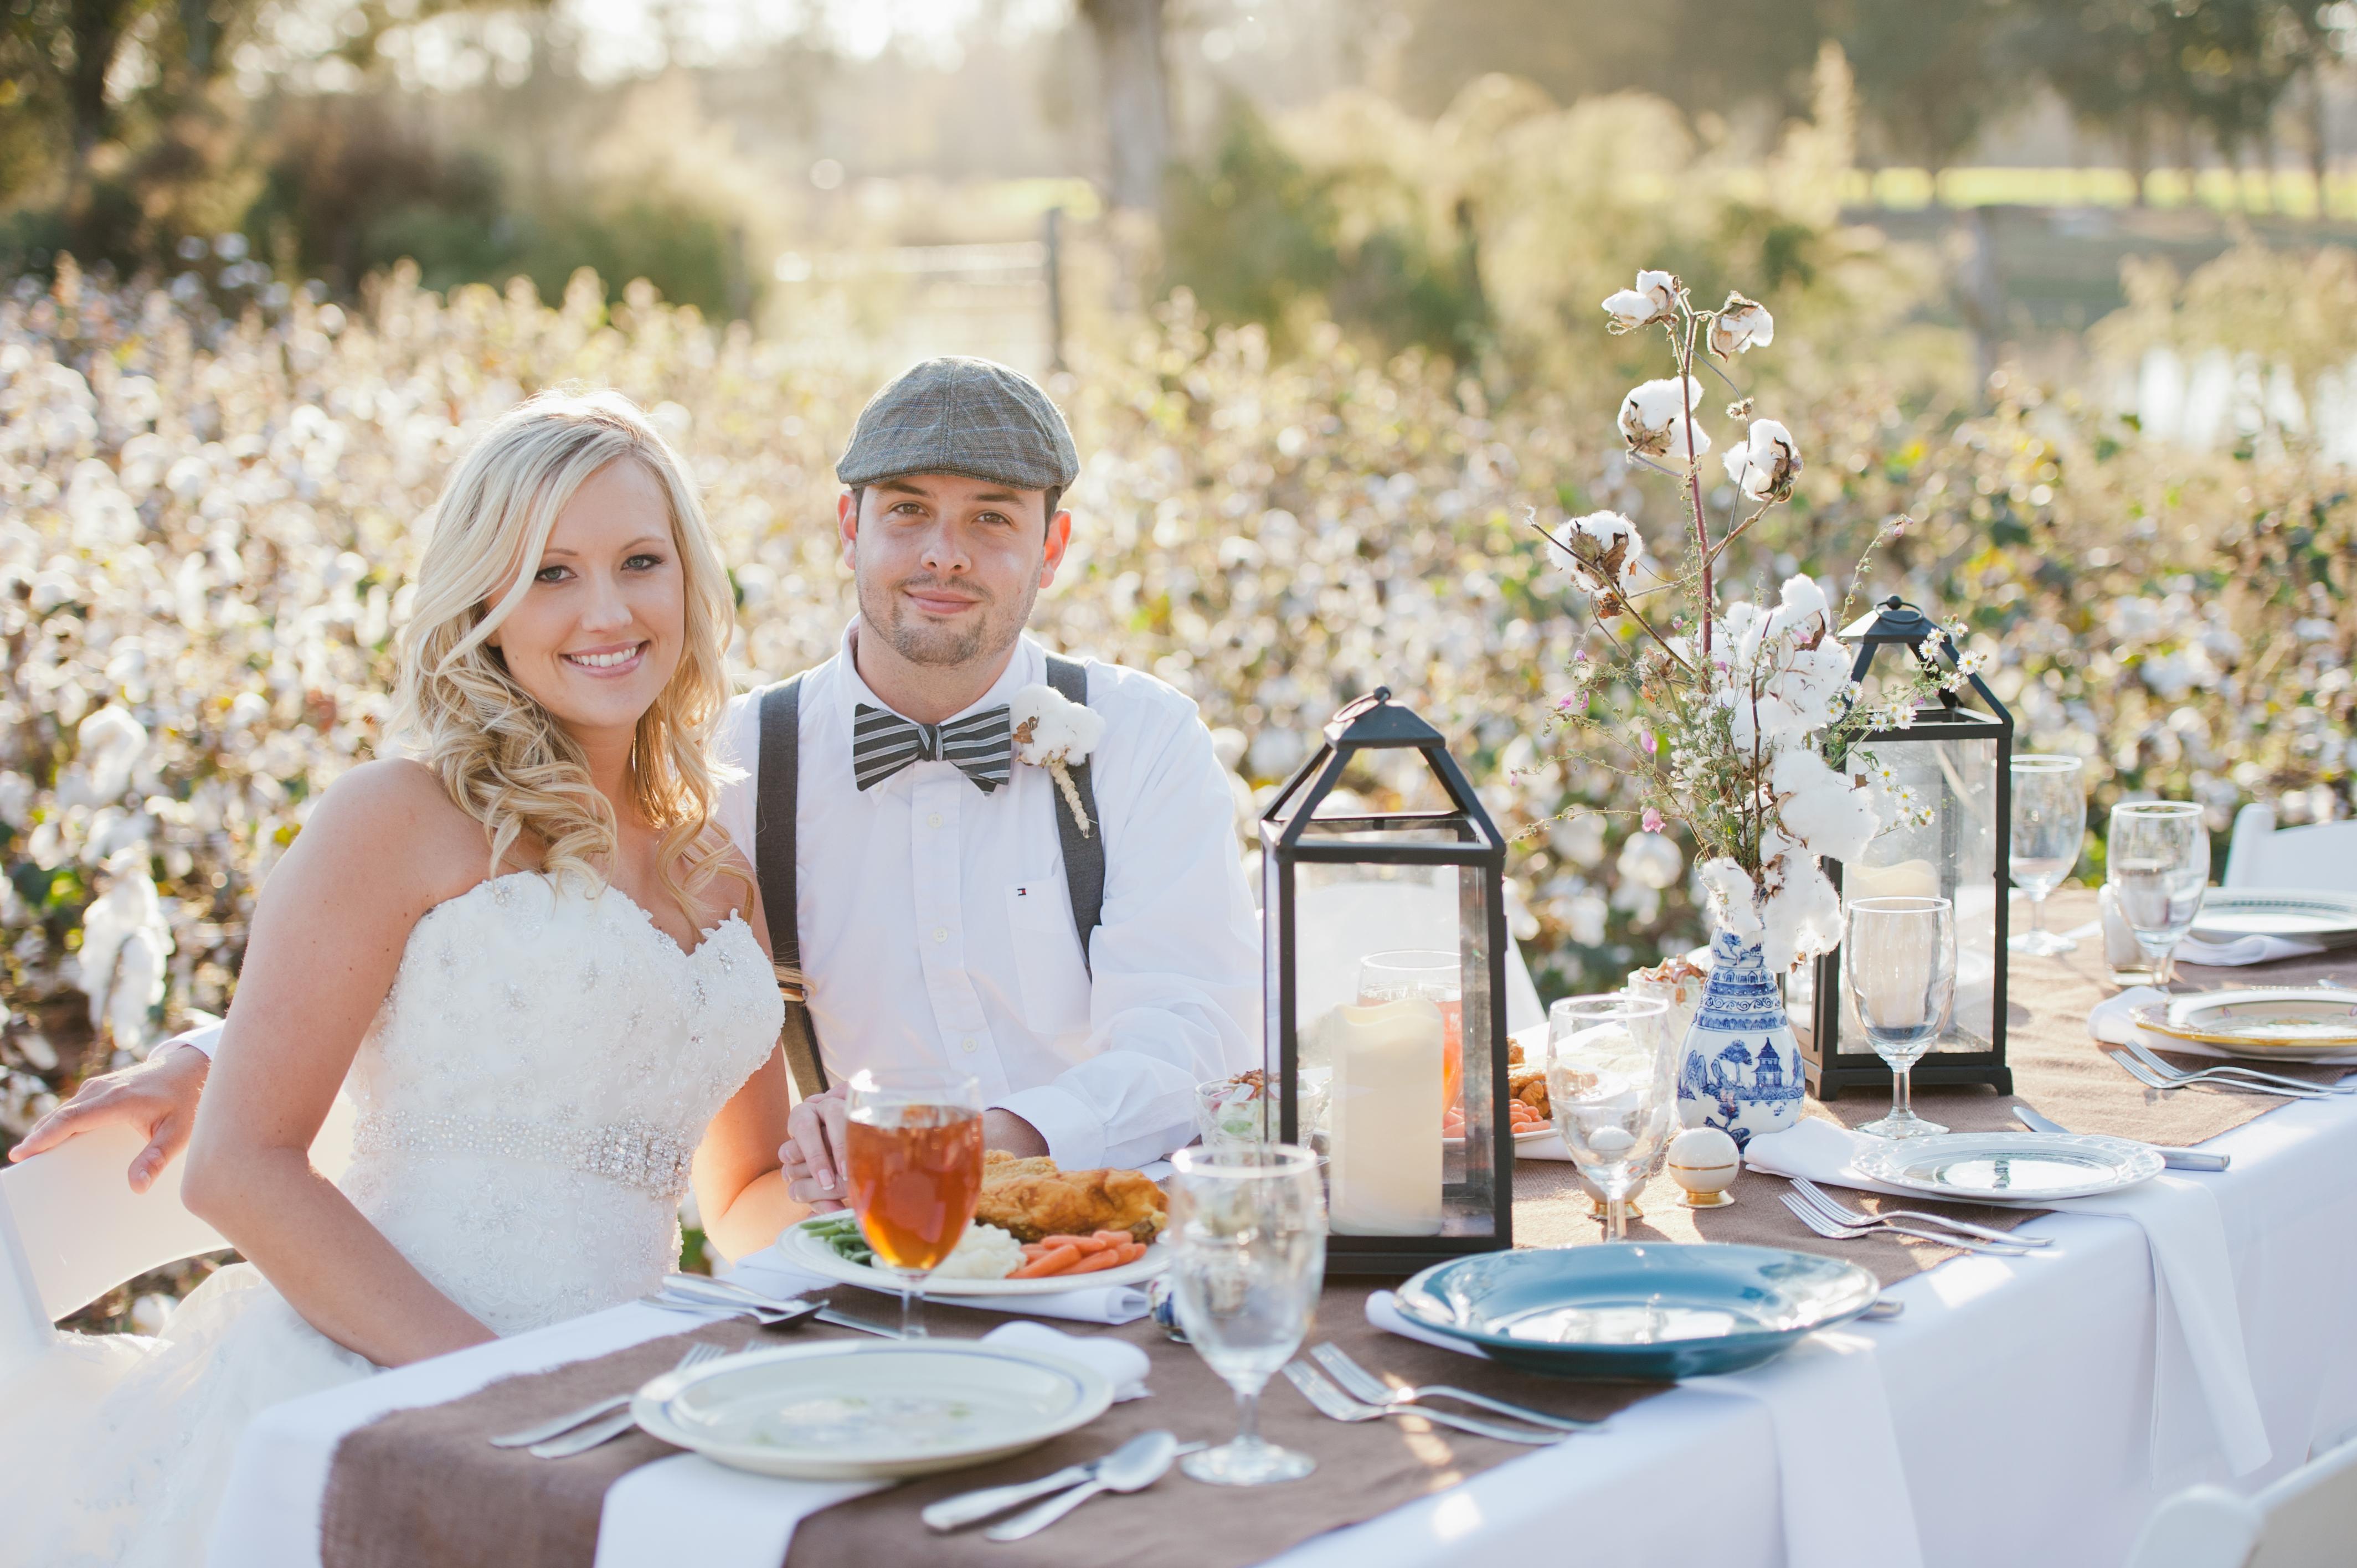 Southern Inspired Wedding Shoot Rustic Wedding Chic